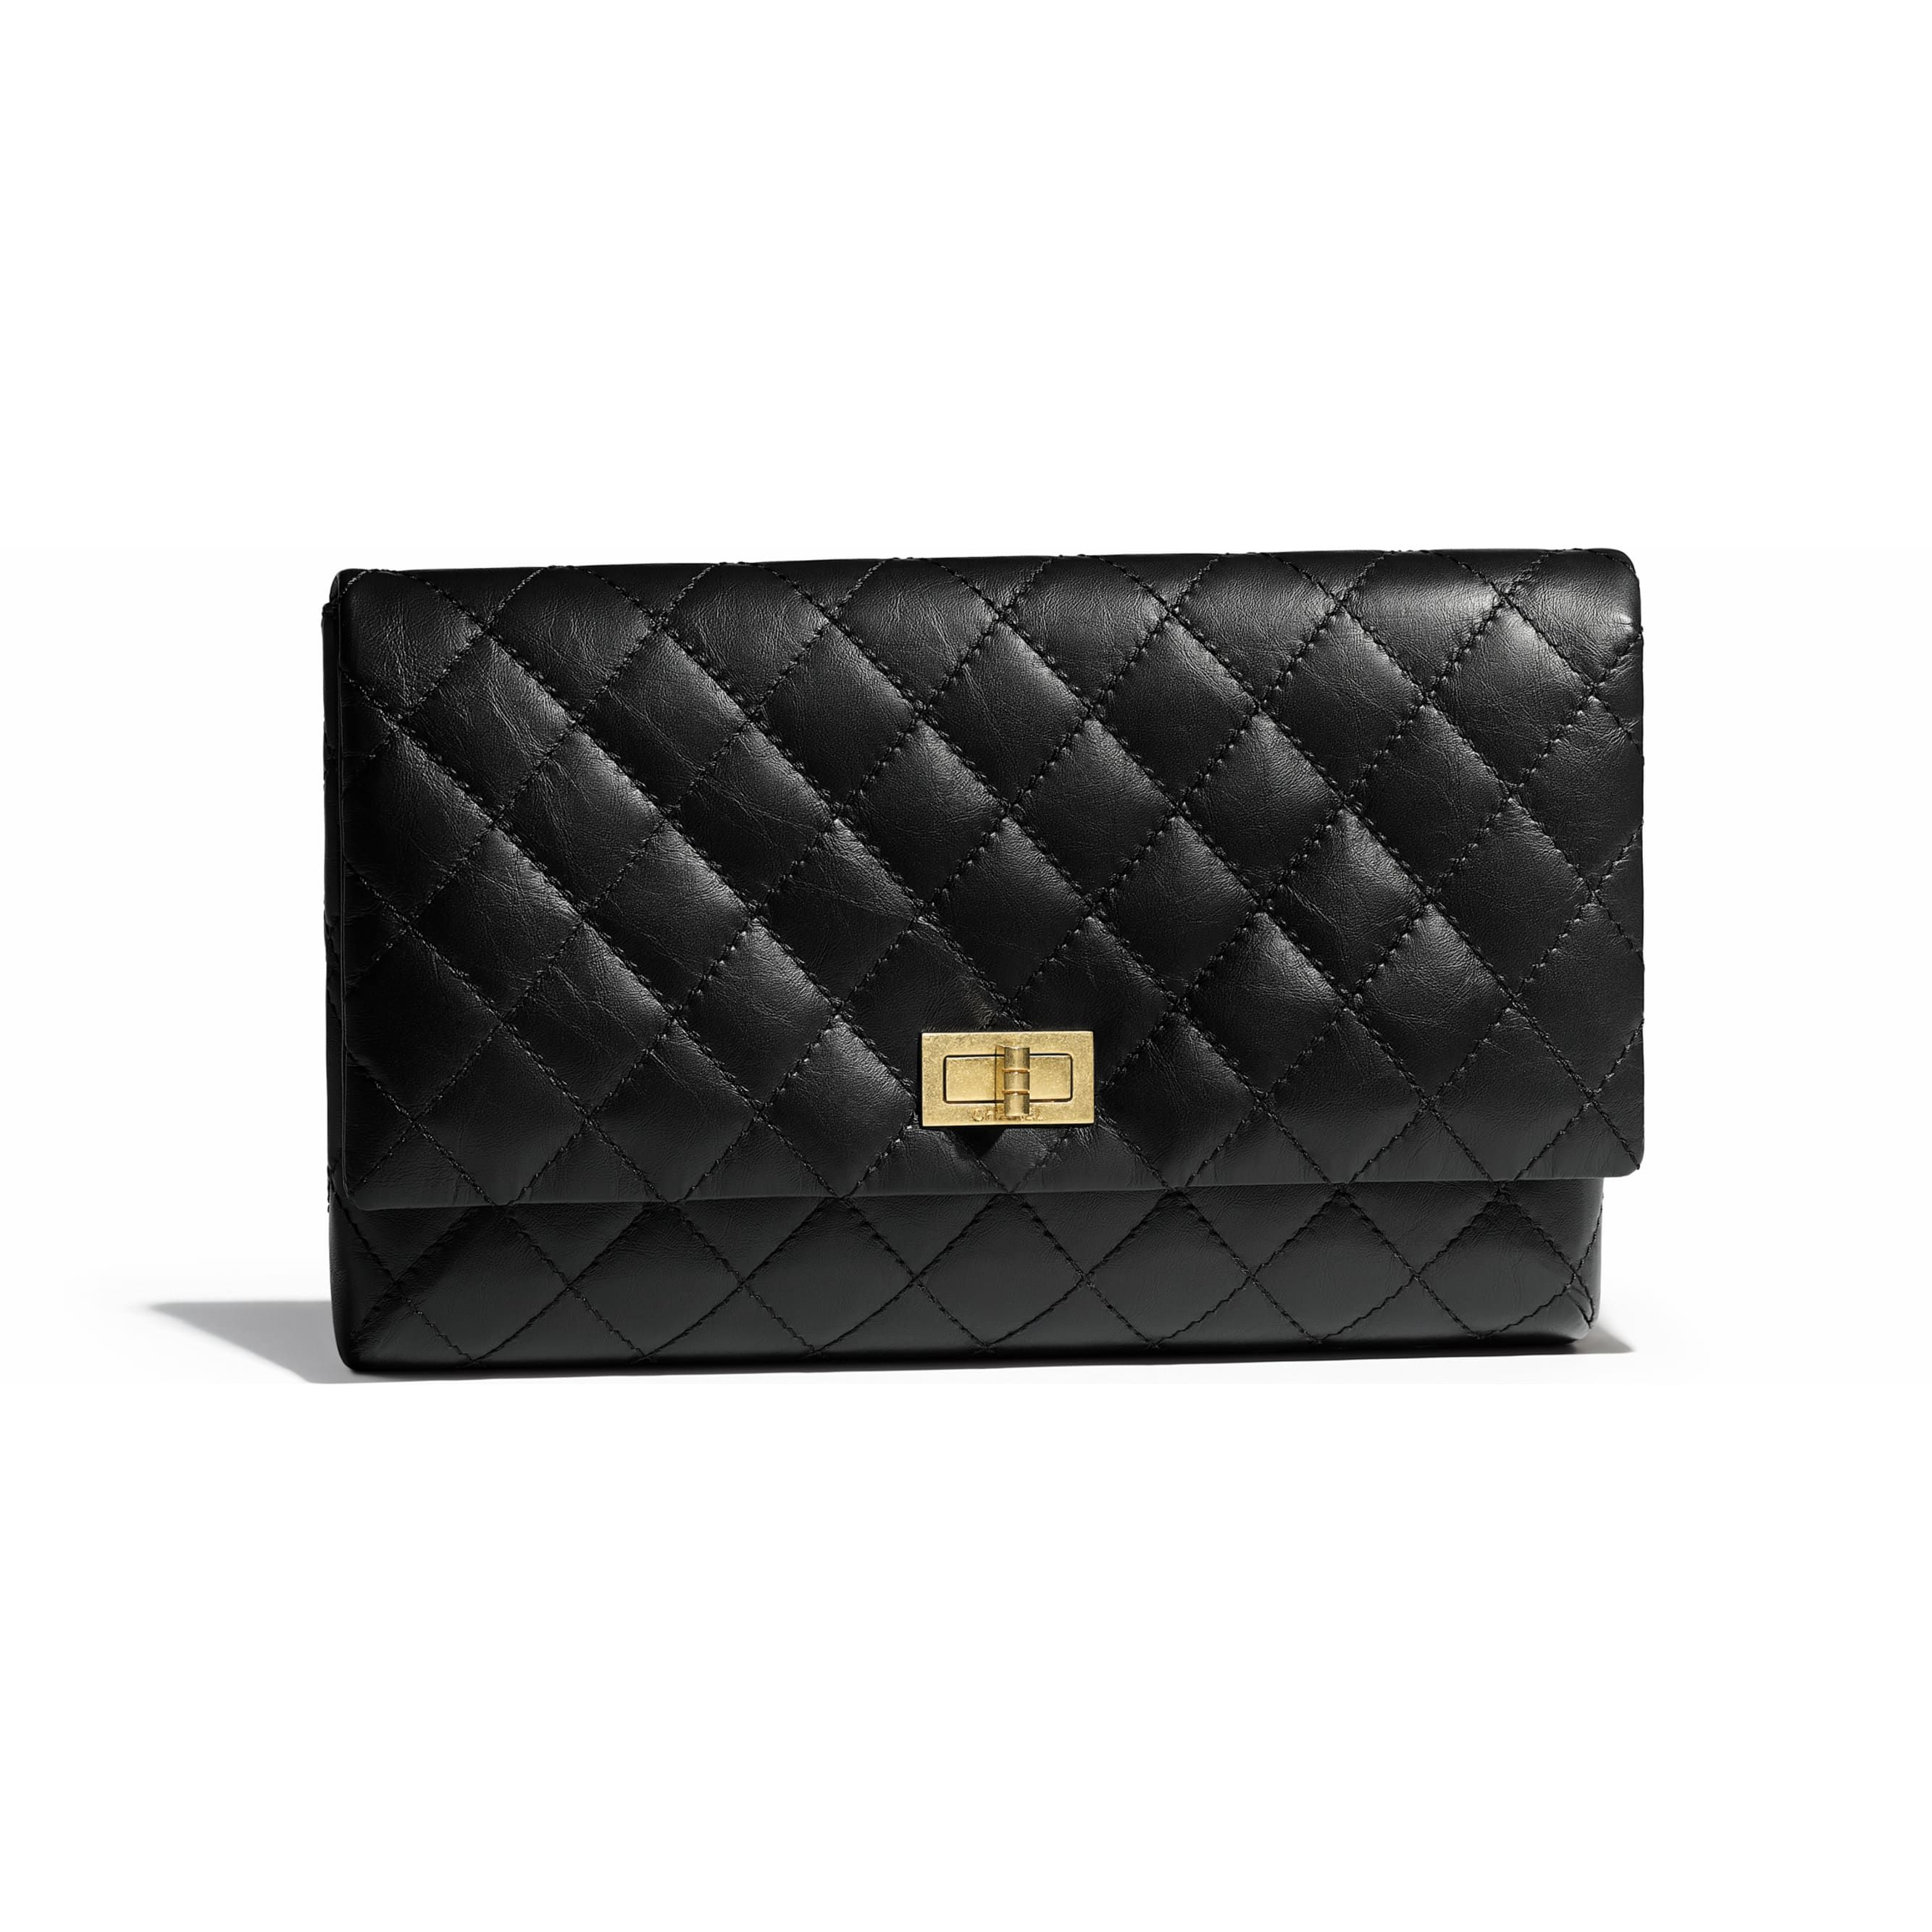 6c9a36a714 Aged Calfskin & Gold-Tone Metal Black Clutch   CHANEL   Bags ...